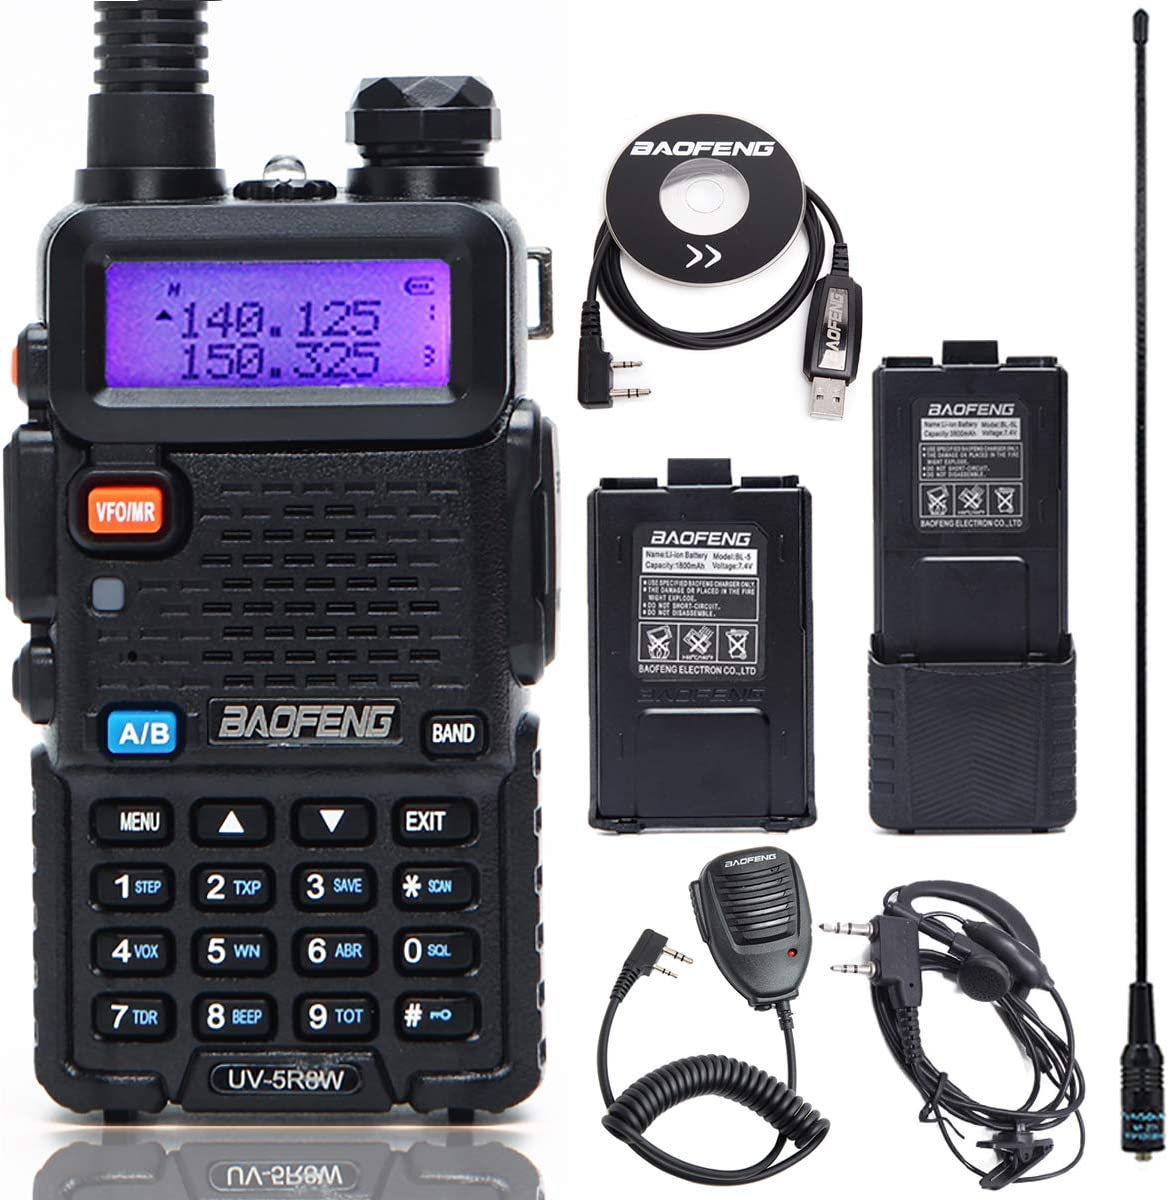 BaoFeng UV-5R Survival radio communication system